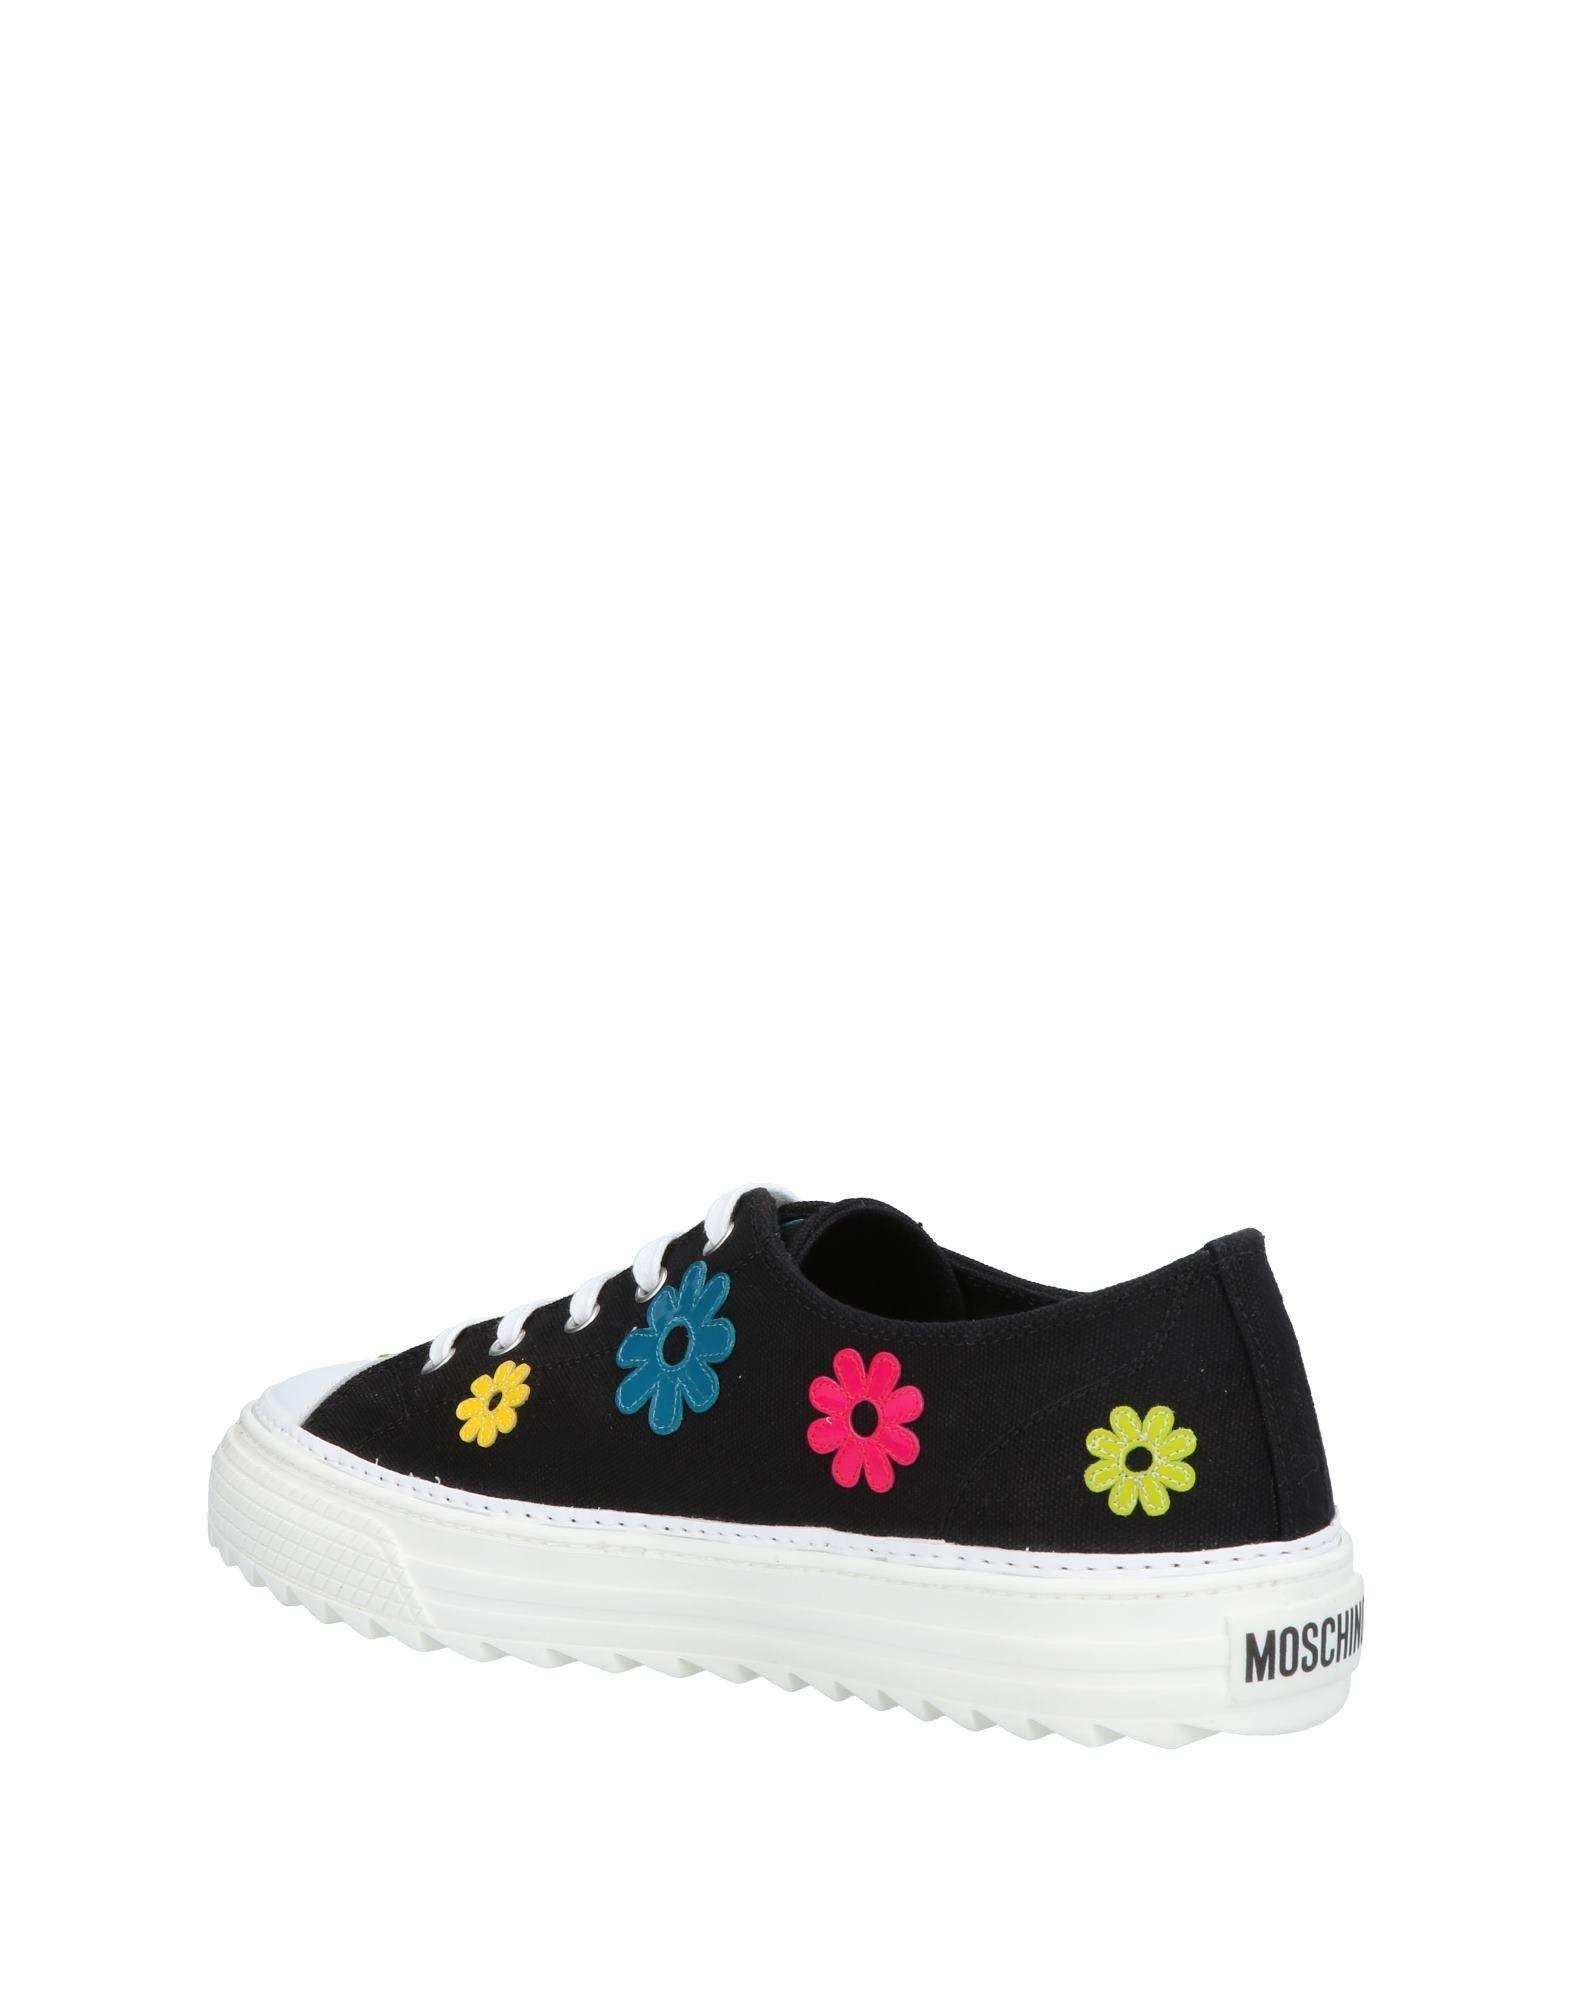 Moschino Heiße Sneakers Herren  11424248VK Heiße Moschino Schuhe 8aa49b